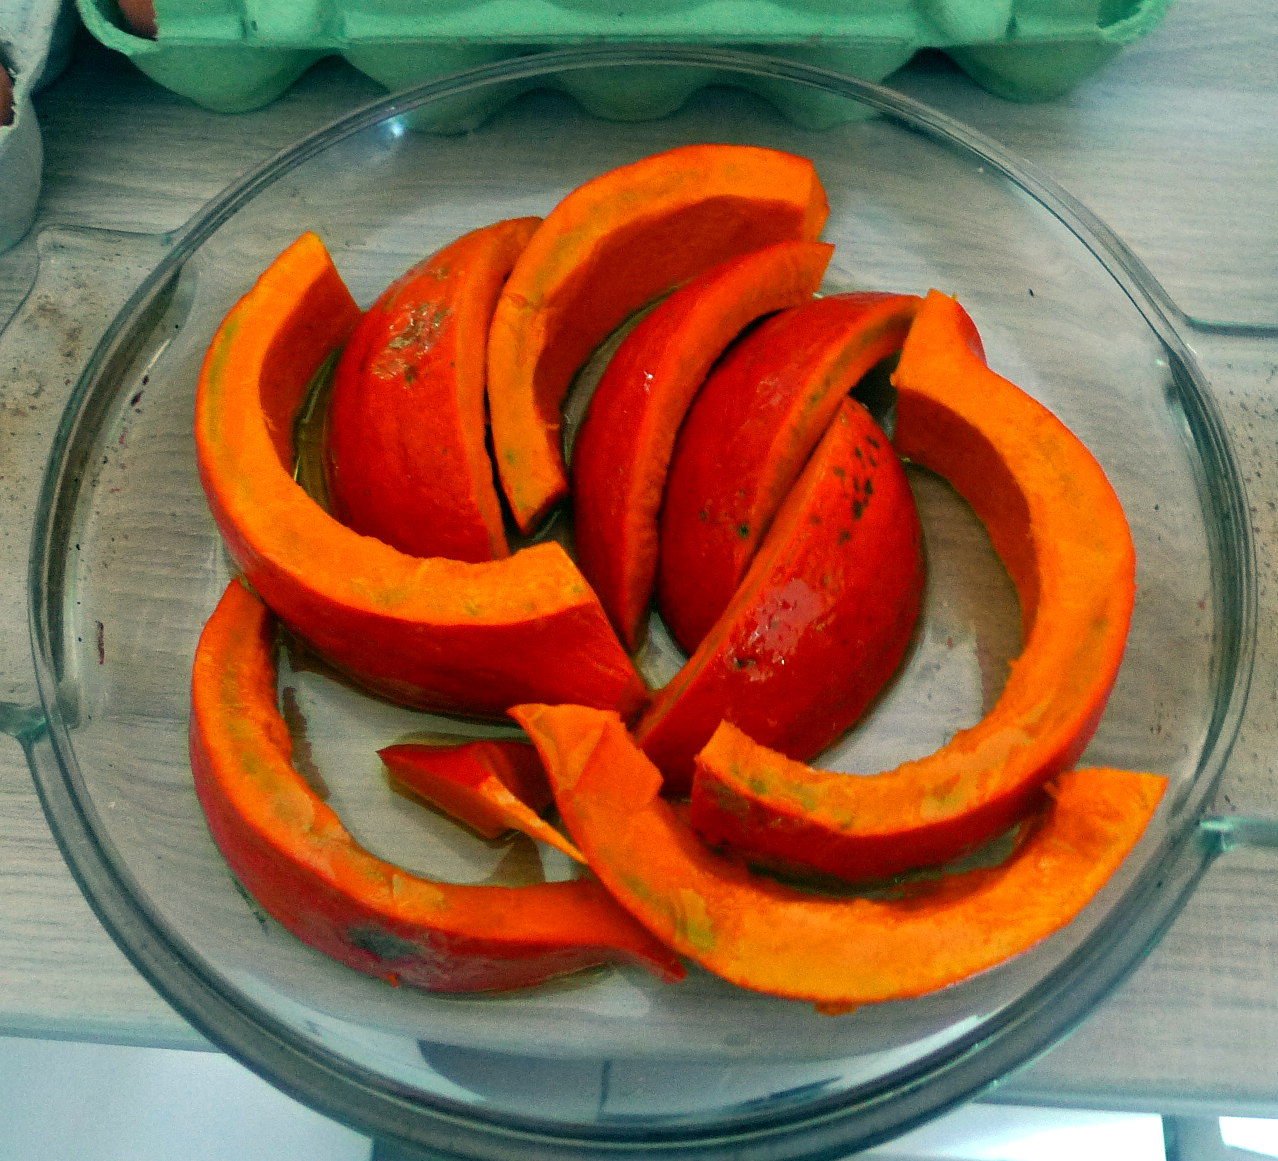 geraucherter-tofuhokkaidopellkartoffelnruhreifeldsalatmirabellenkompottvegetarisch-1c